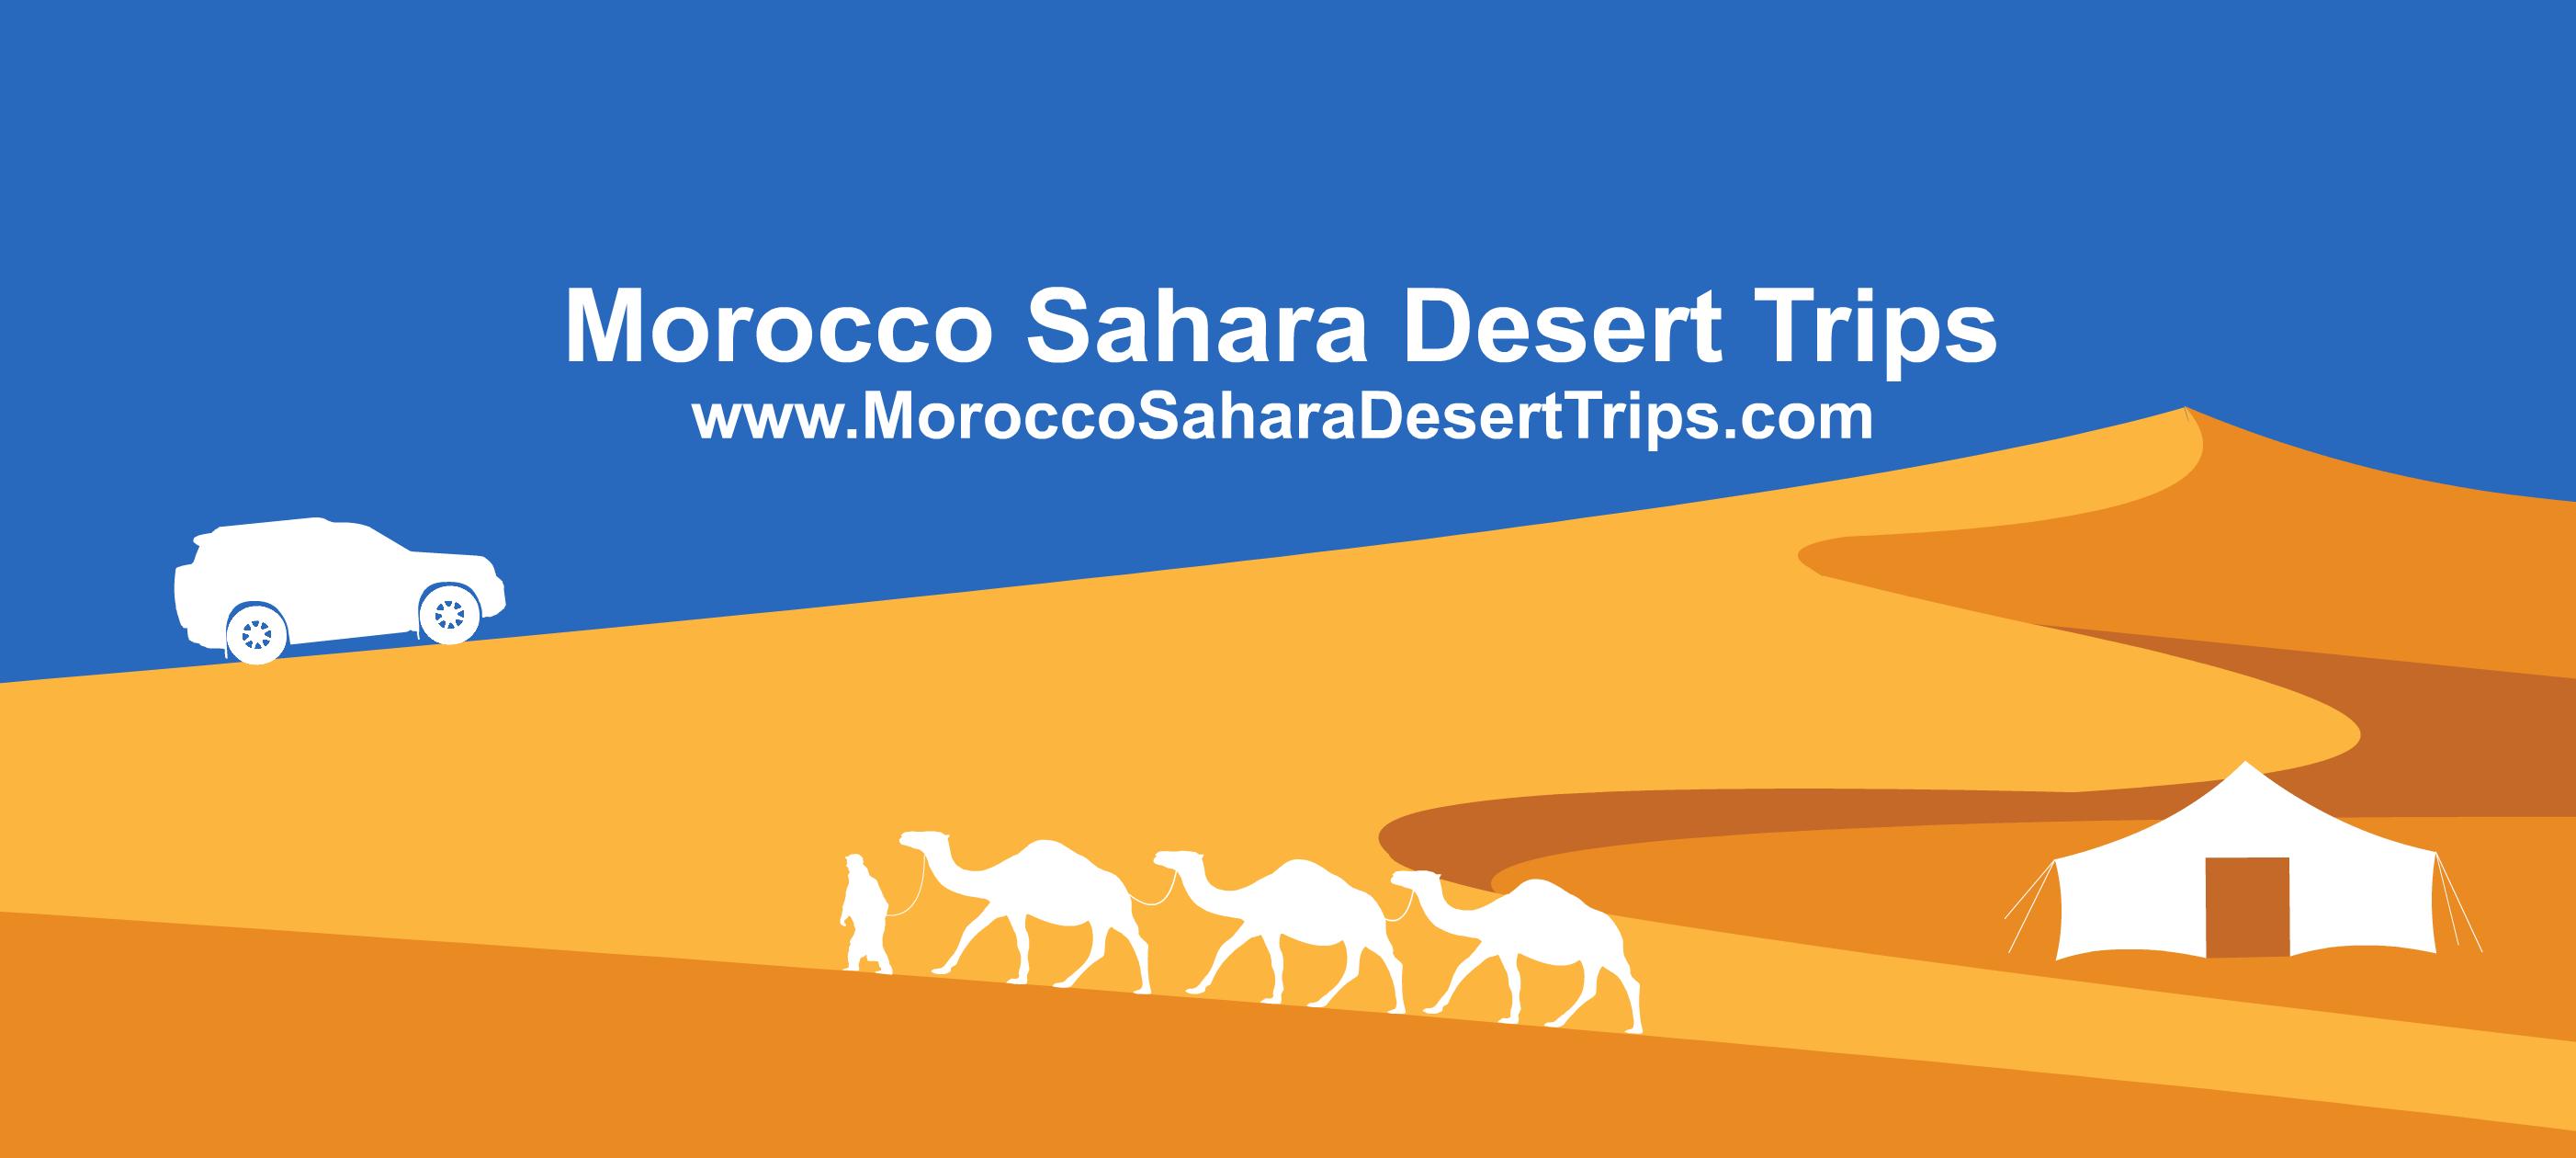 Morocco Sahara Desert Trips